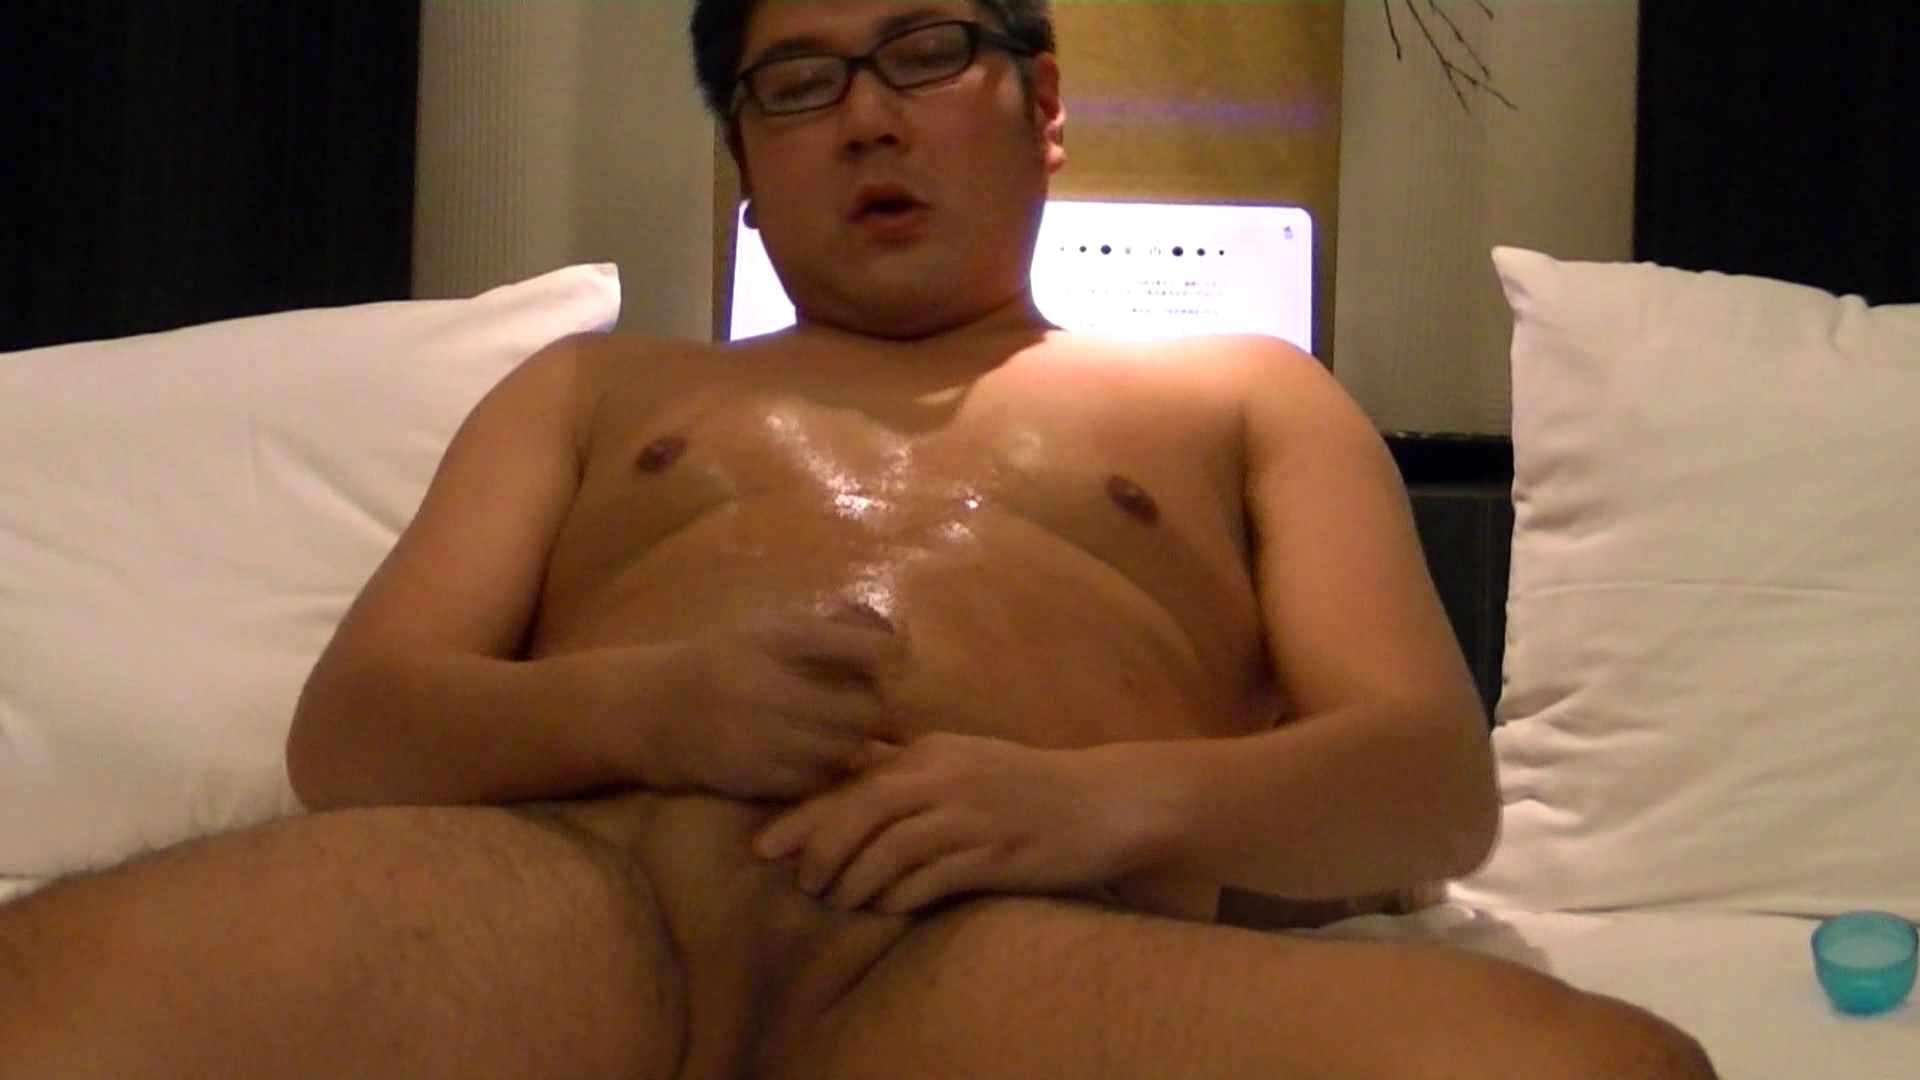 Mr.オナックスさん投稿!HD 貴方のオナニー三万円で撮影させてください。VOL.03 後編 完全無修正でお届け | オナニー特集  83pic 49